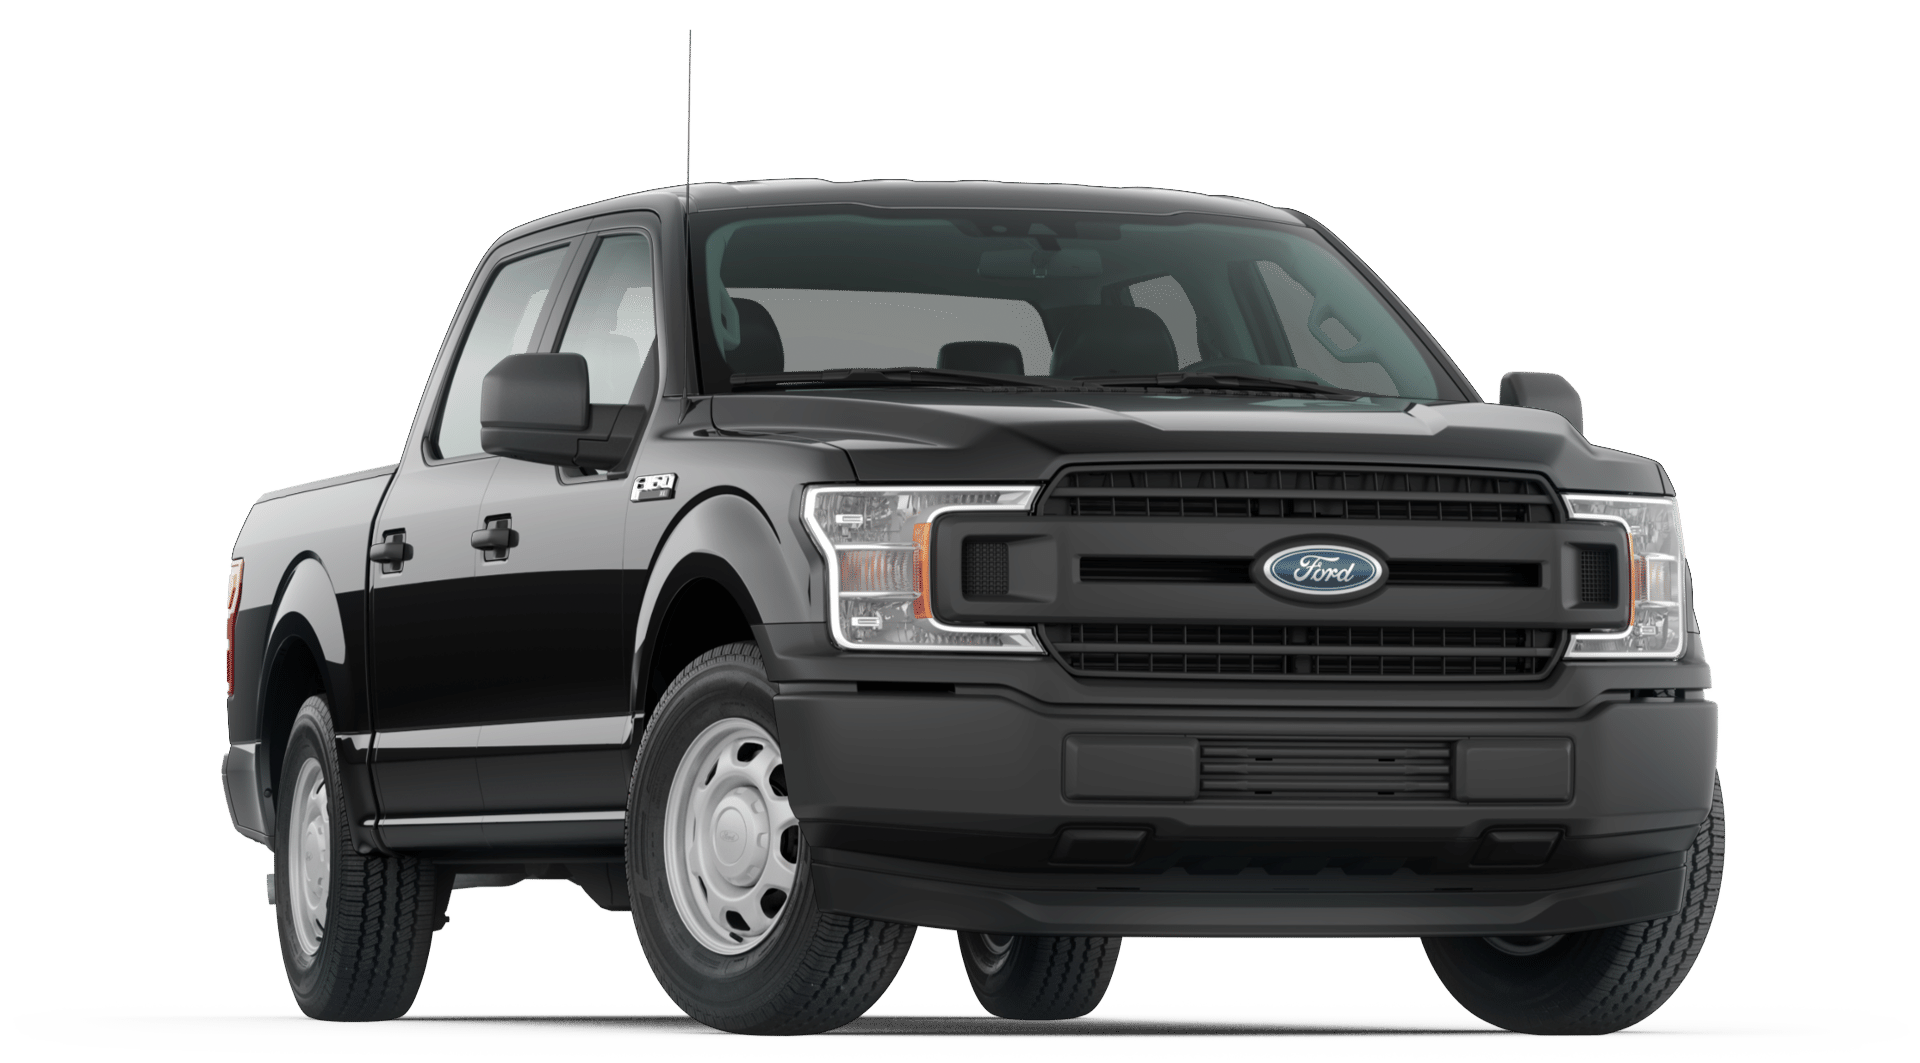 Austin Ford - 2020 Ford F-150 SuperCrew 5.5